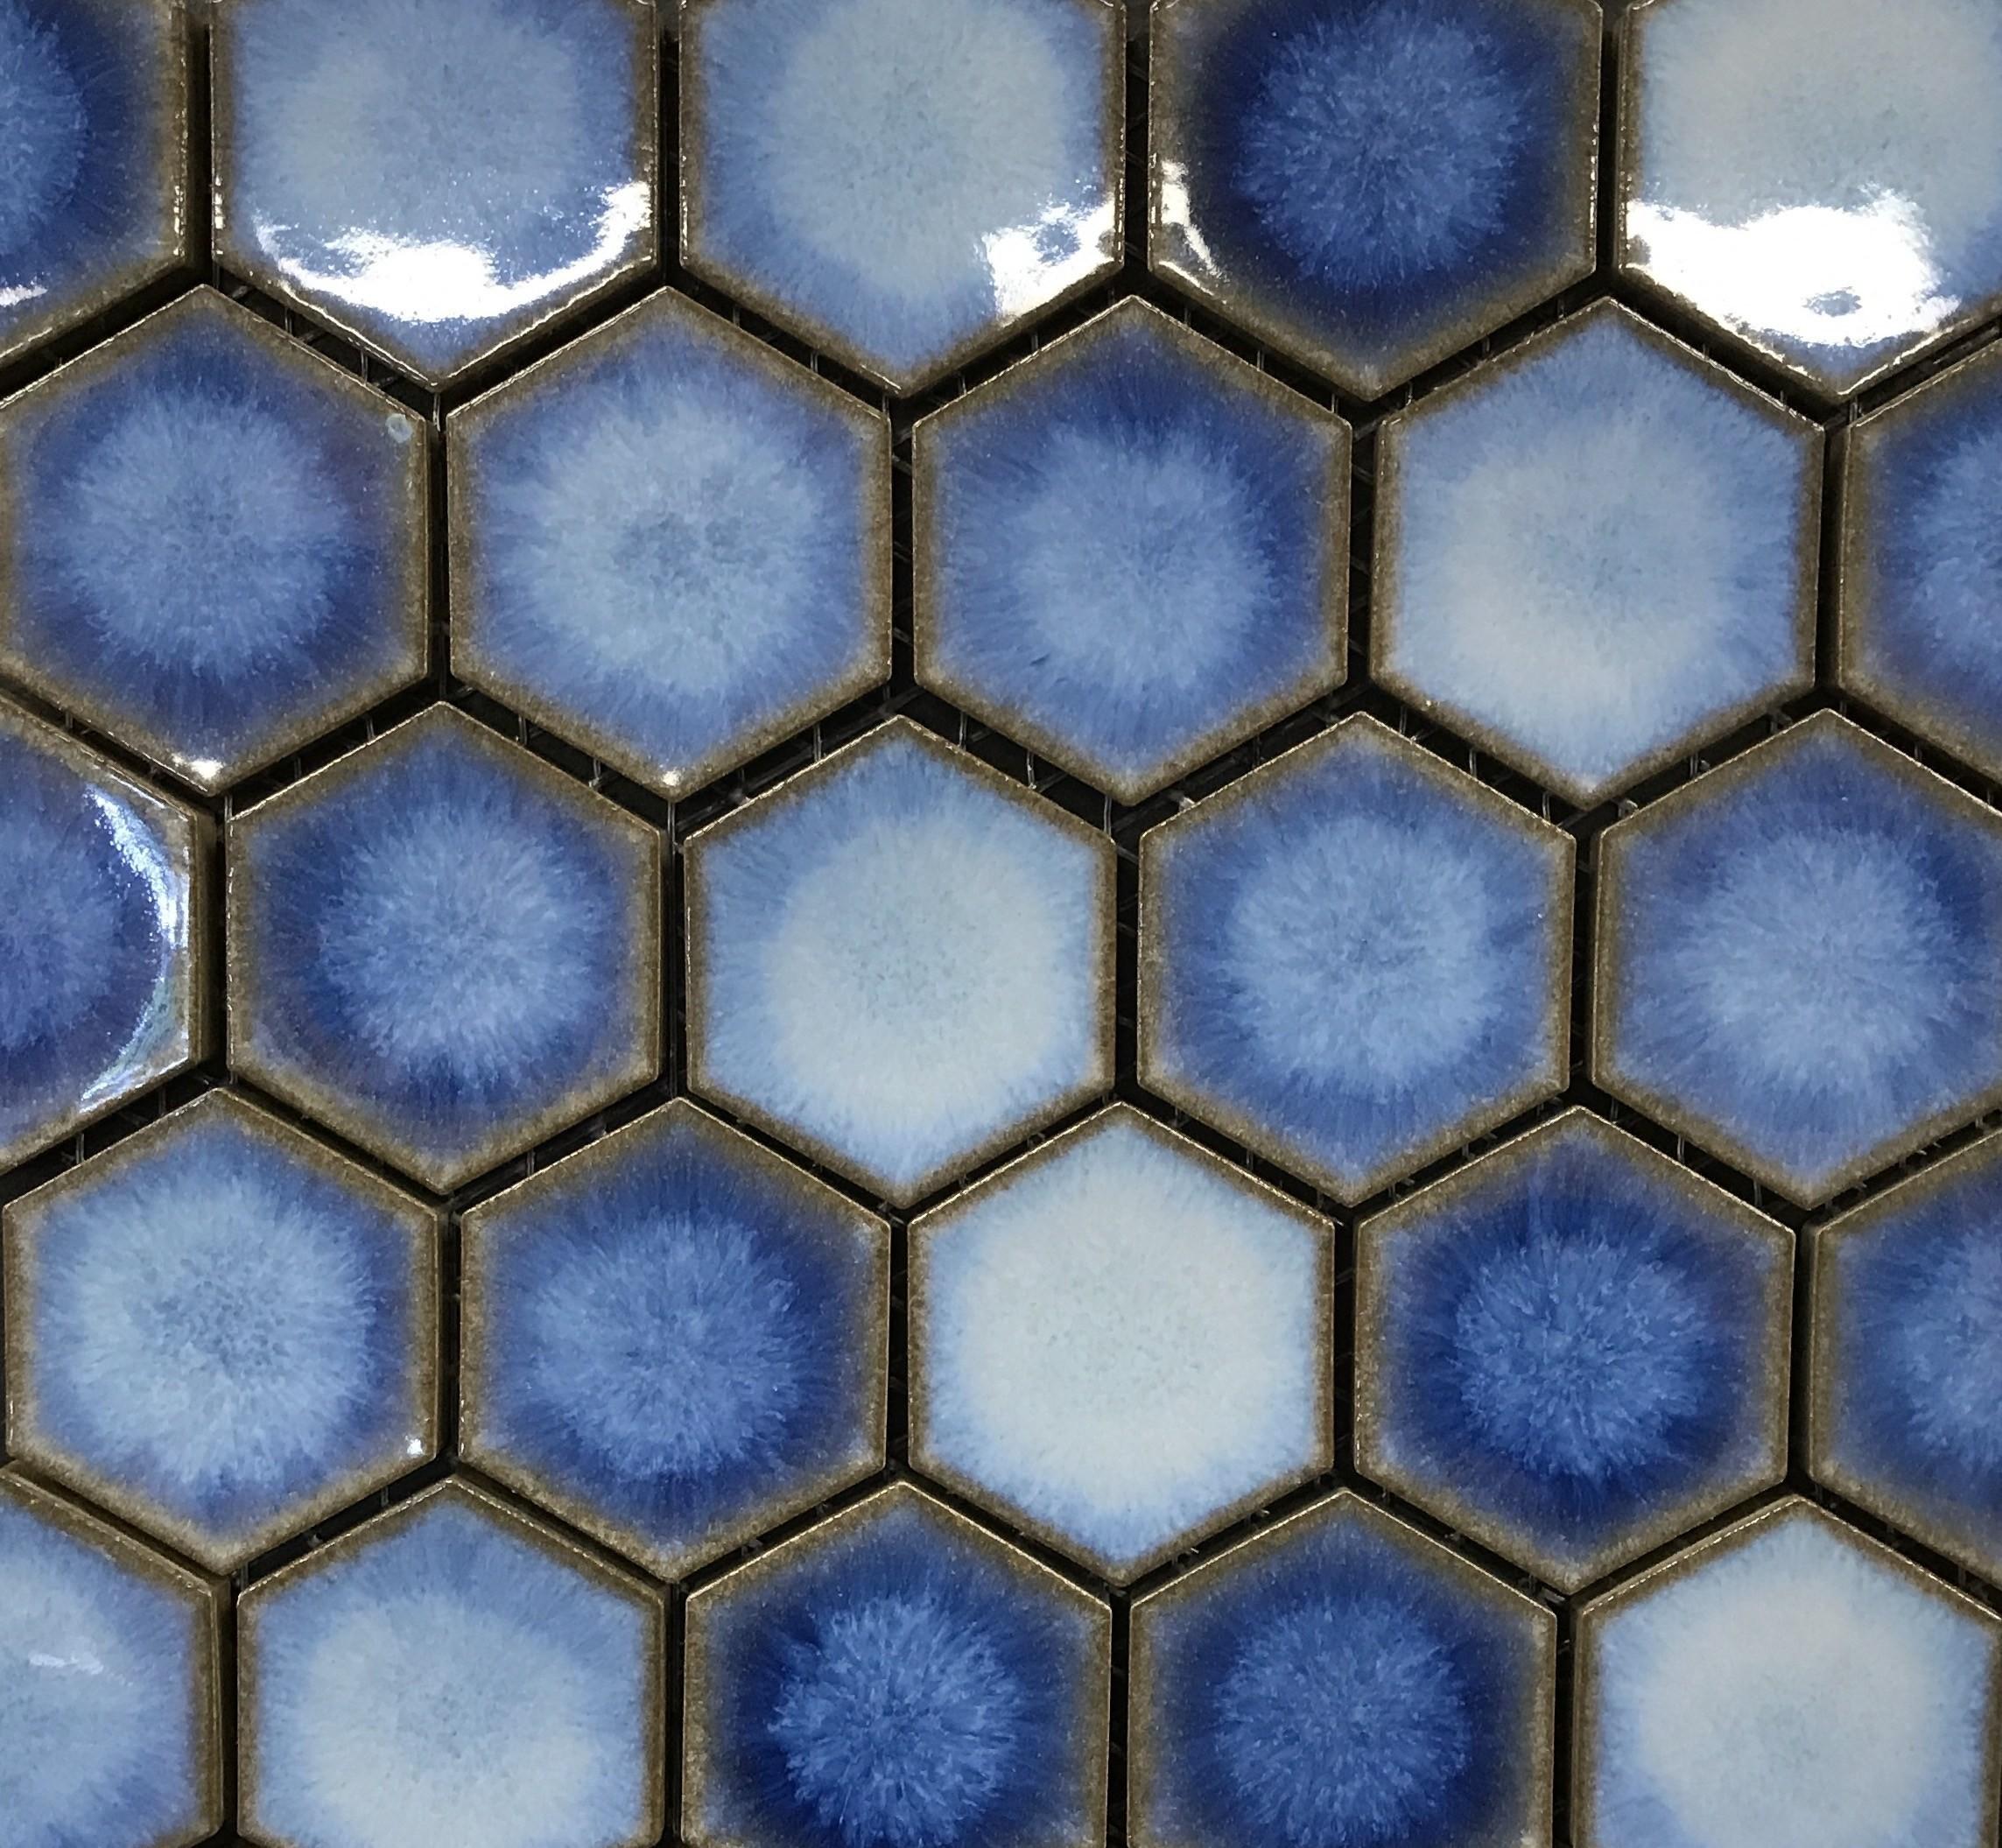 Where to buy Odyssey Porcelain tiles. Cepac Tile.